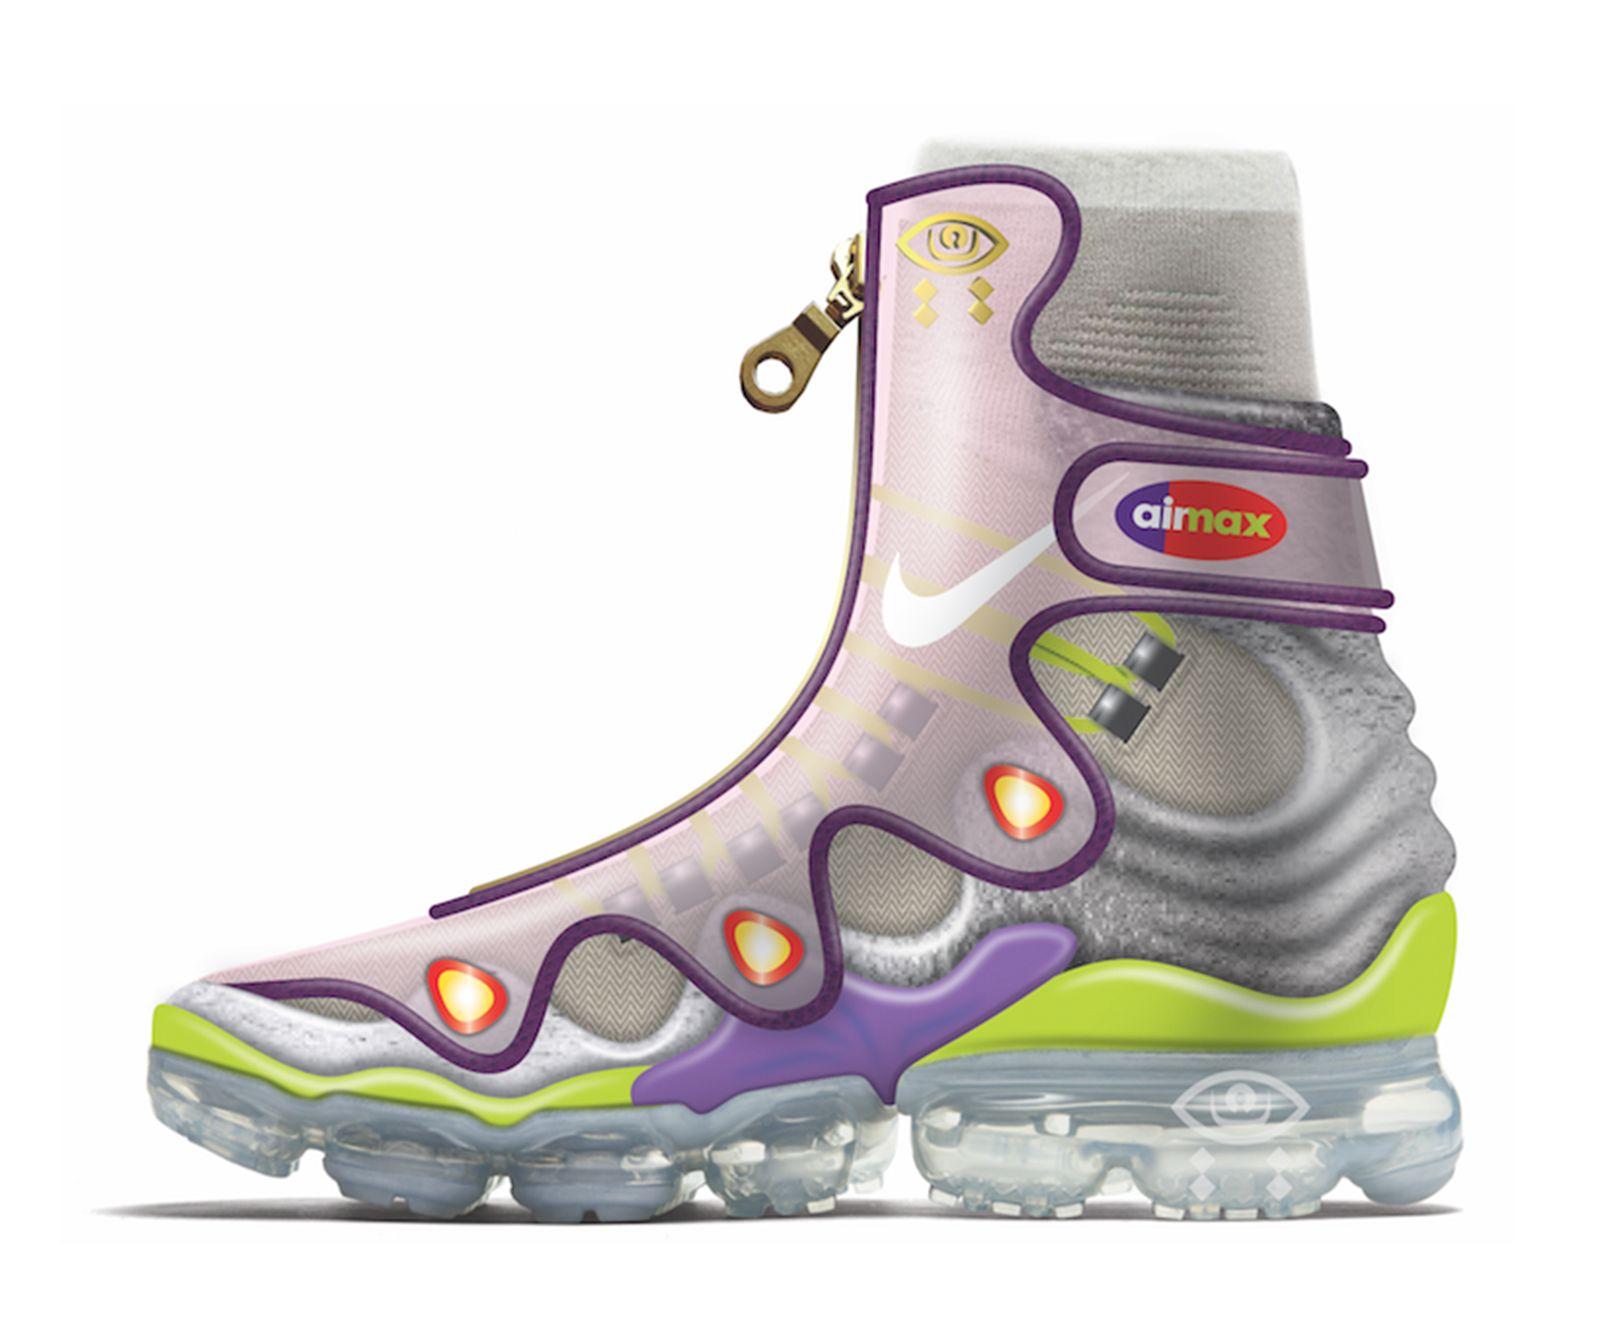 A Closer Look at the COMME des GARÇONS x Nike ACG Mowabb | Active Footwear  | Pinterest | Nike acg, Hypebeast and Footwear